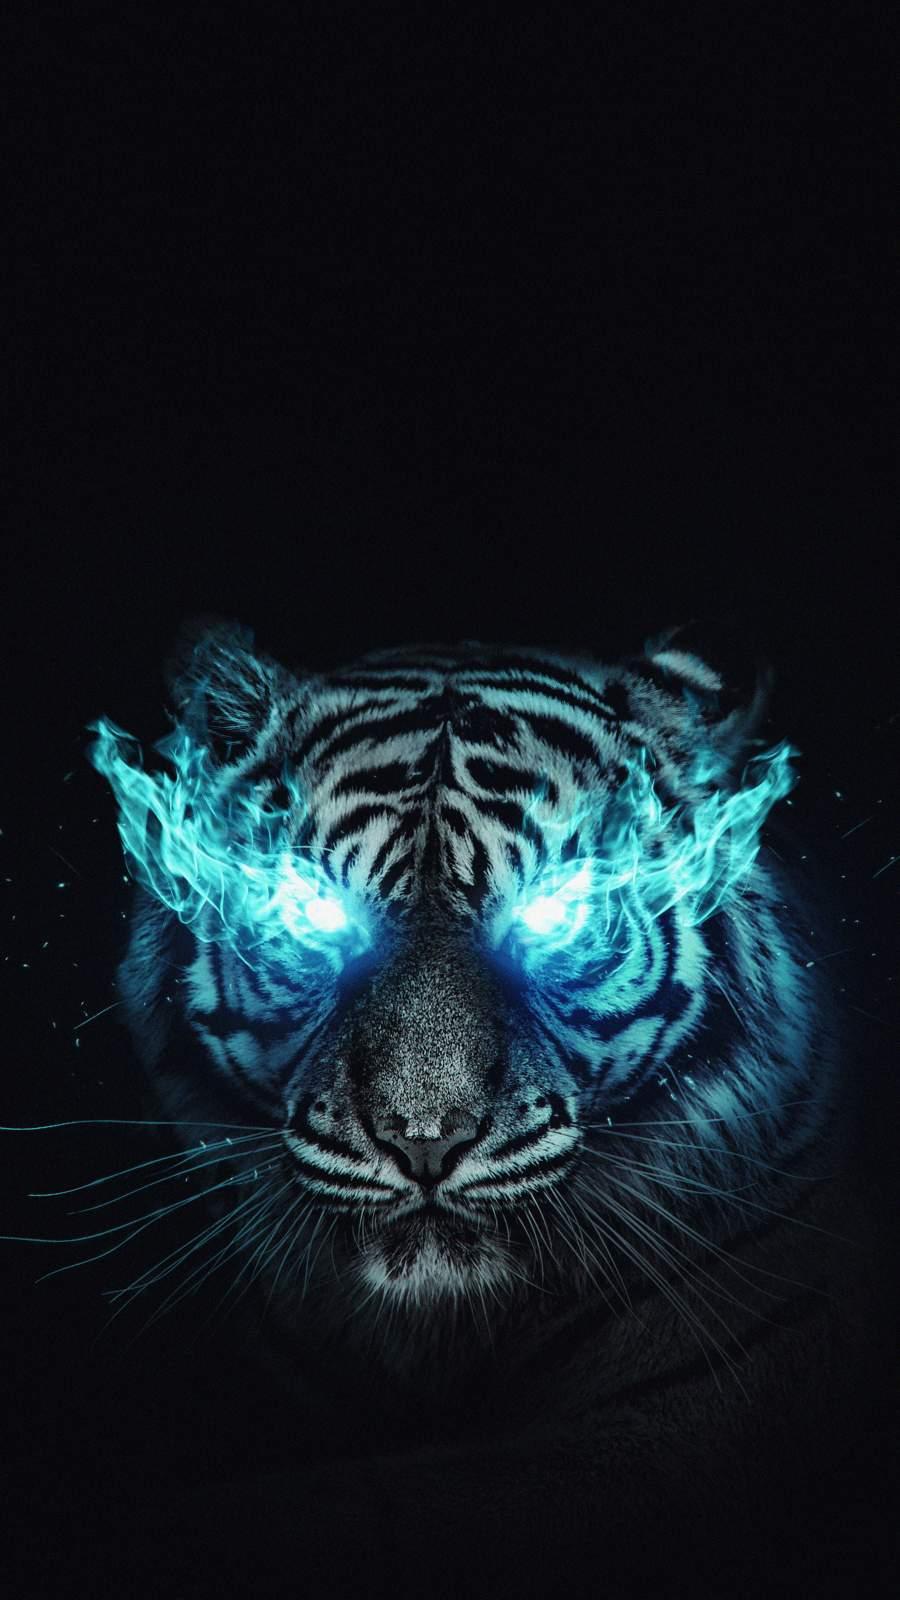 White Tiger iPhone Wallpaper